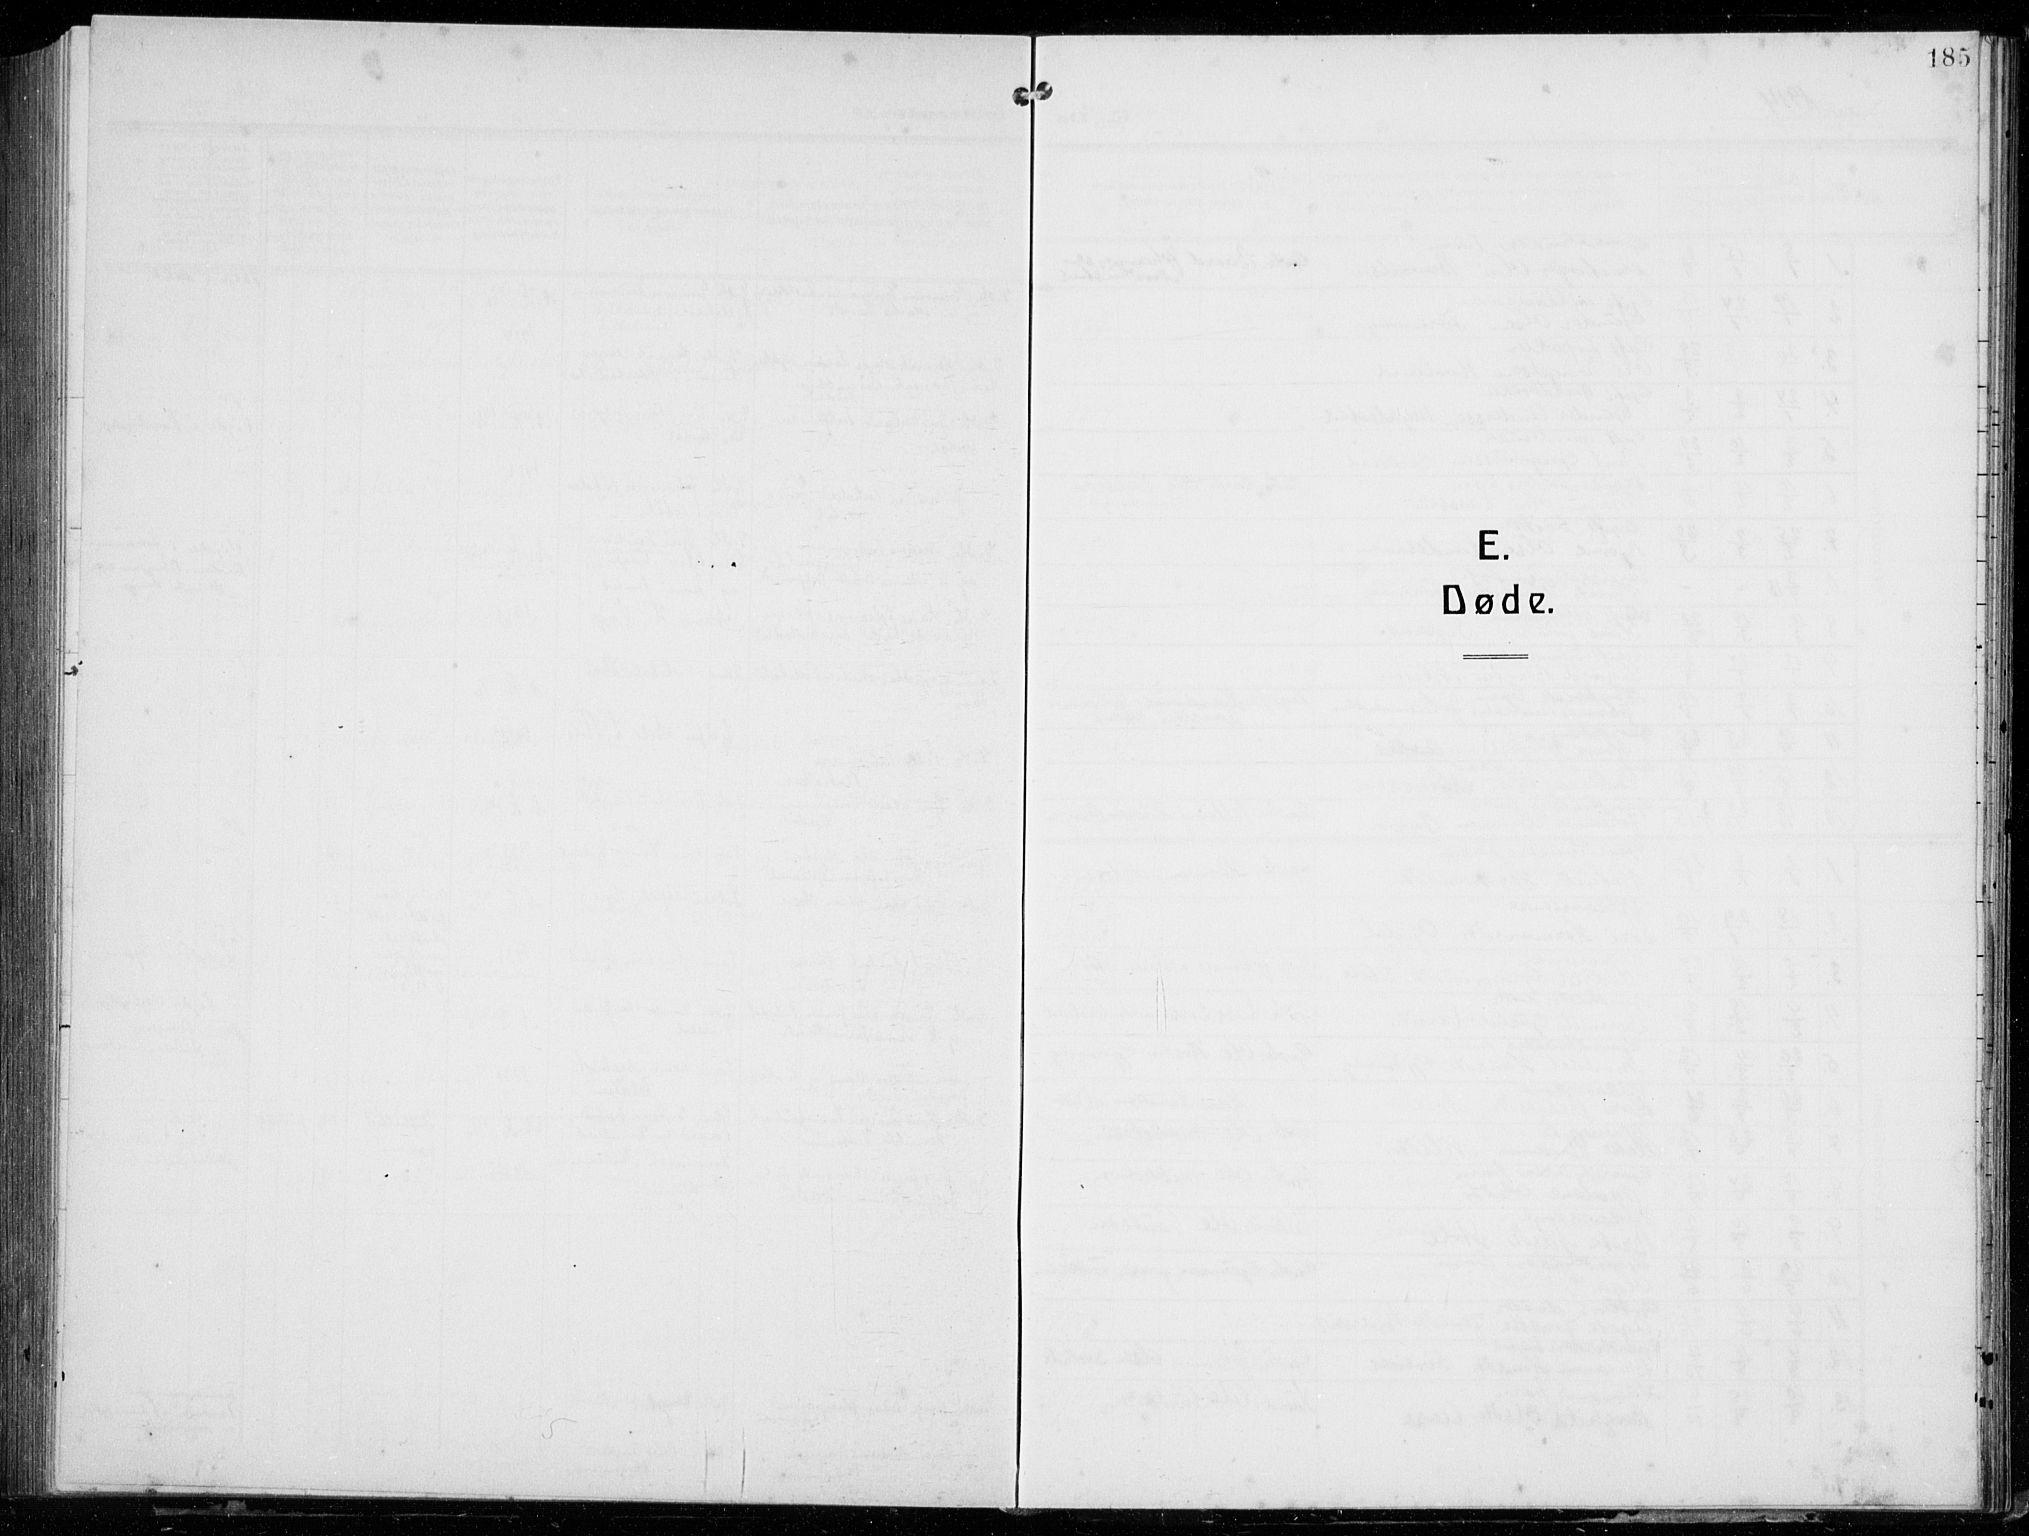 SAB, Tysnes Sokneprestembete, H/Hab: Parish register (copy) no. E  4, 1912-1936, p. 185